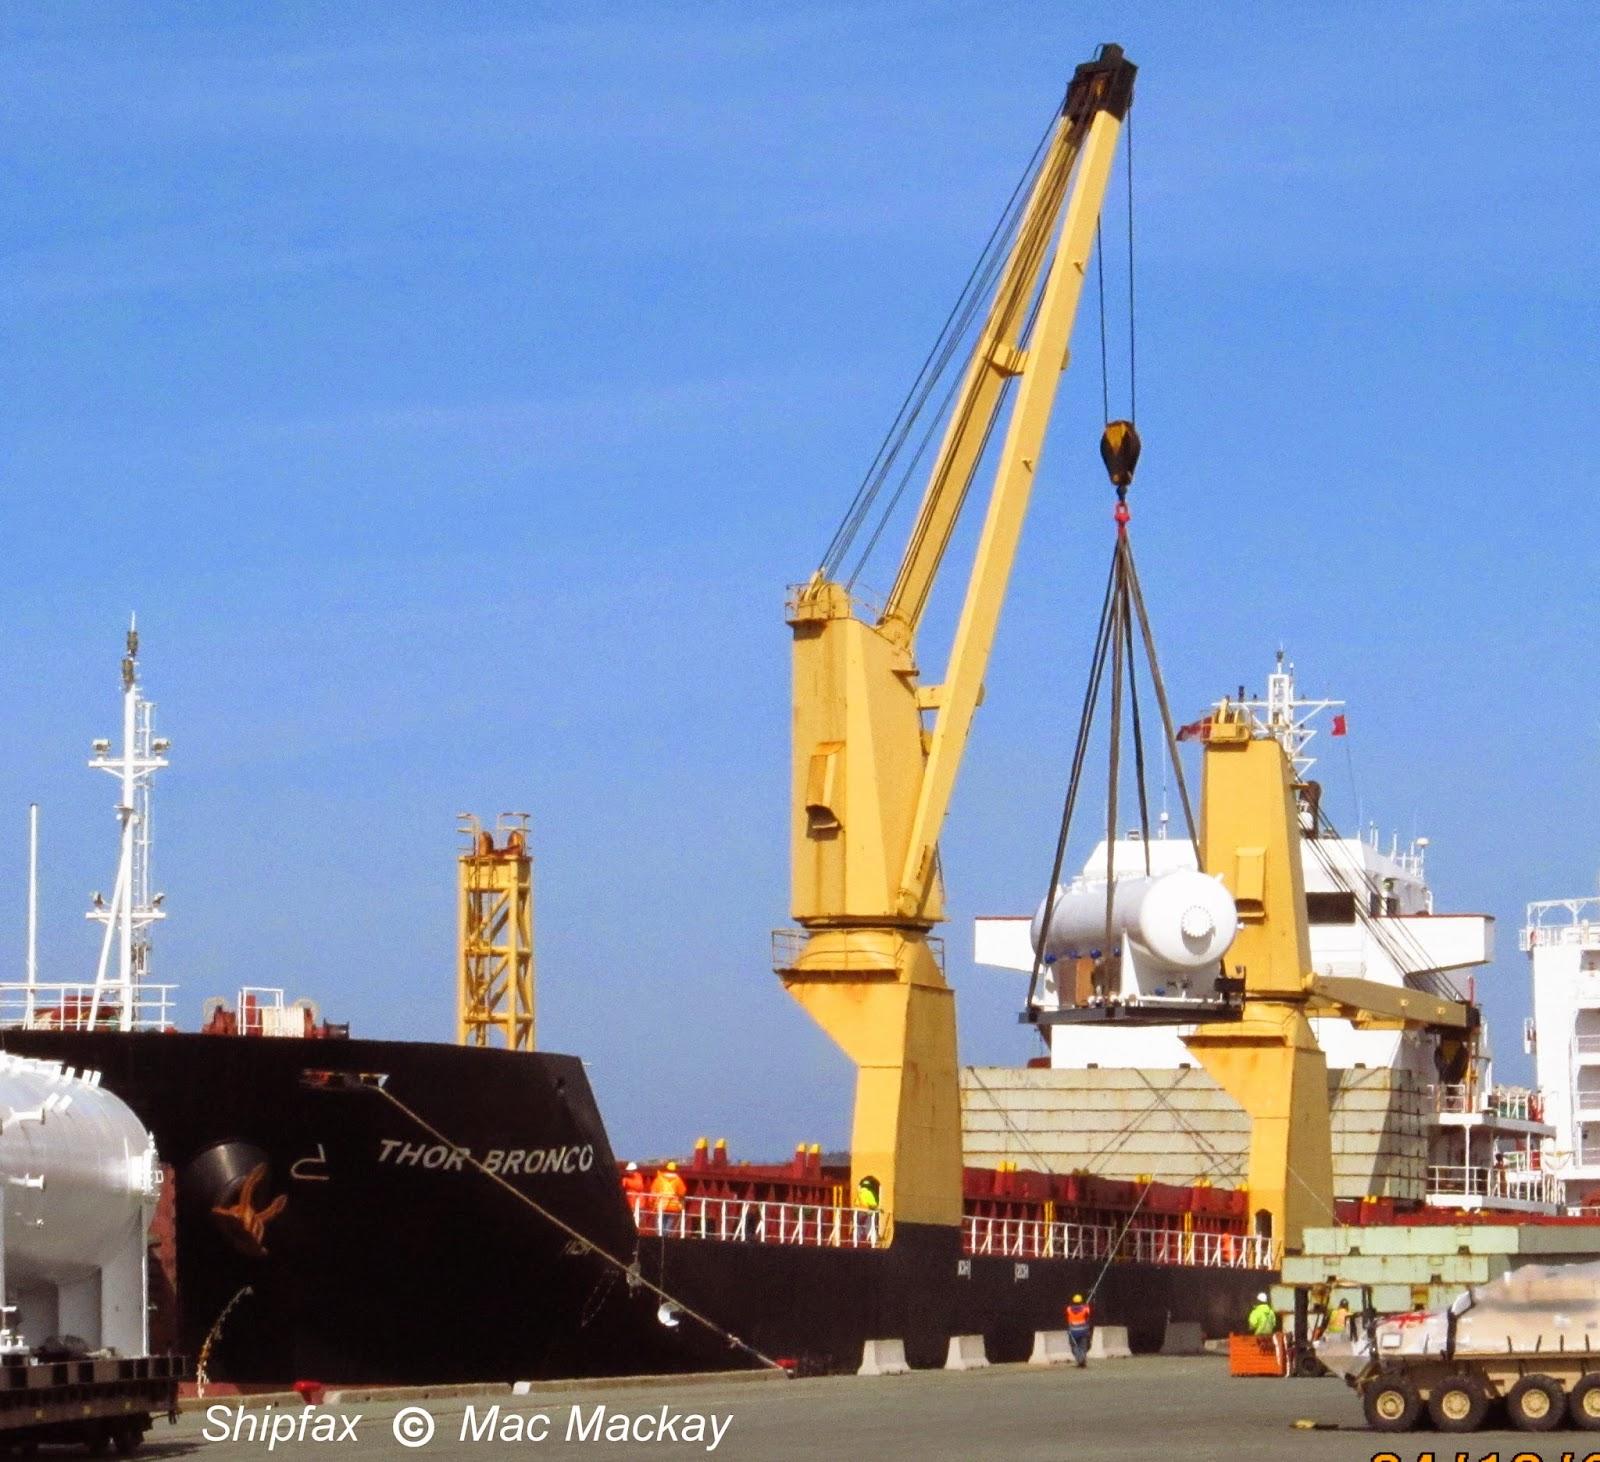 Pier 31: Shipfax: Busy Pier 30-31 Thor Bronco